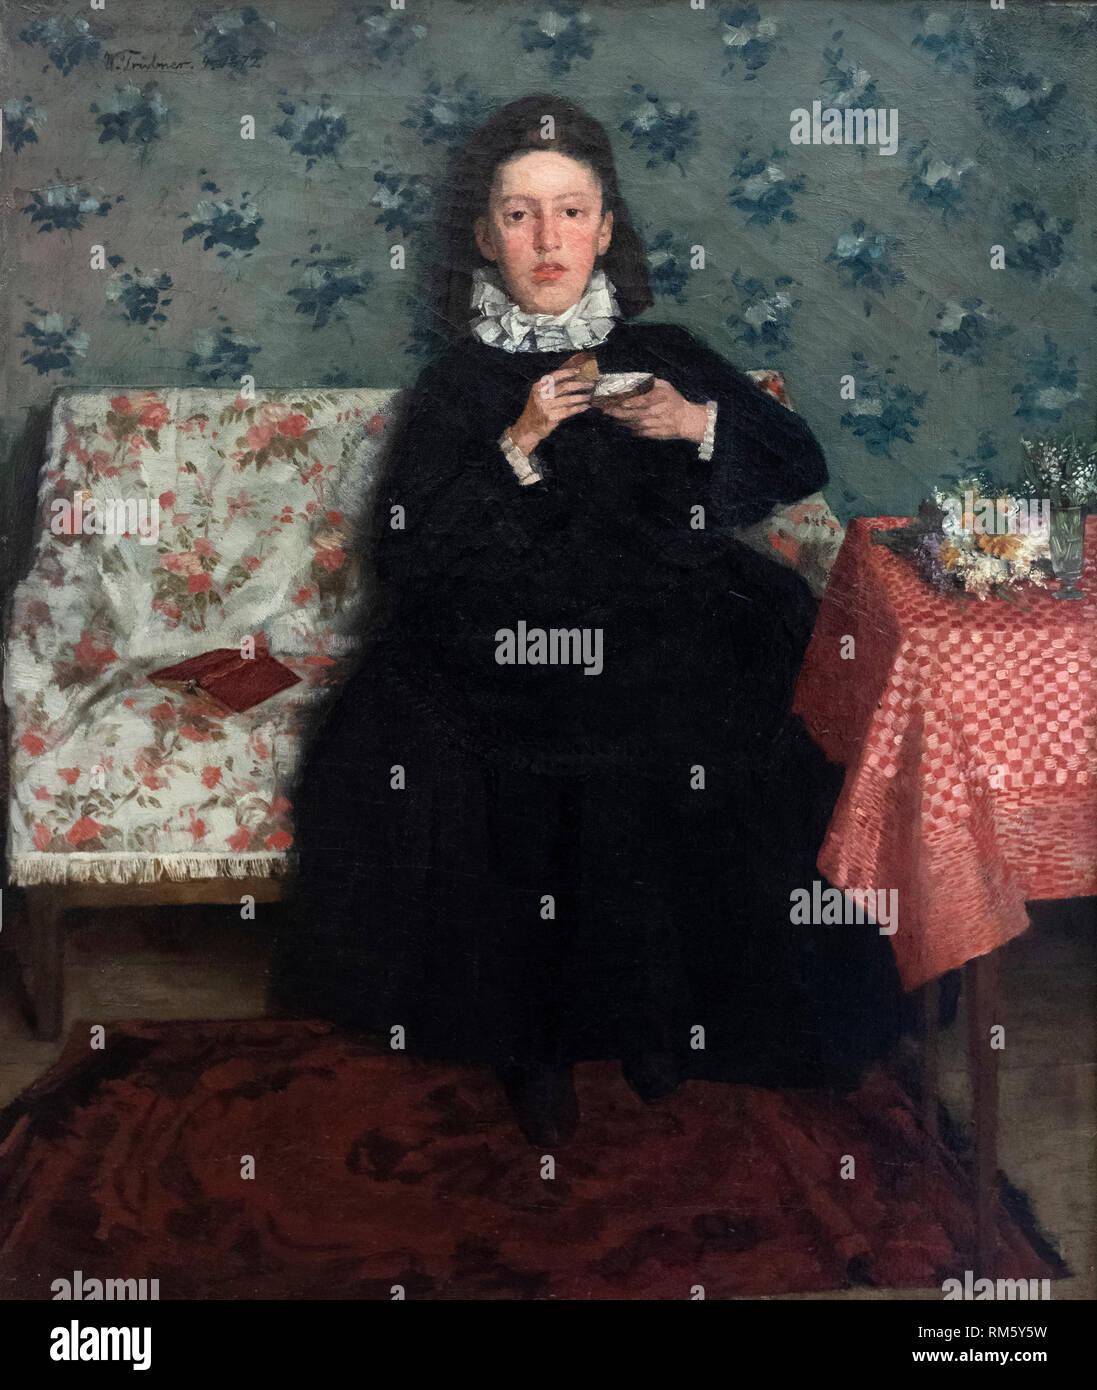 Wilhelm Trübner (1851-1917), auf dem Sofa, 1872. Auf dem Kanapee. Alte Nationalgalerie, Berlin. Stockbild